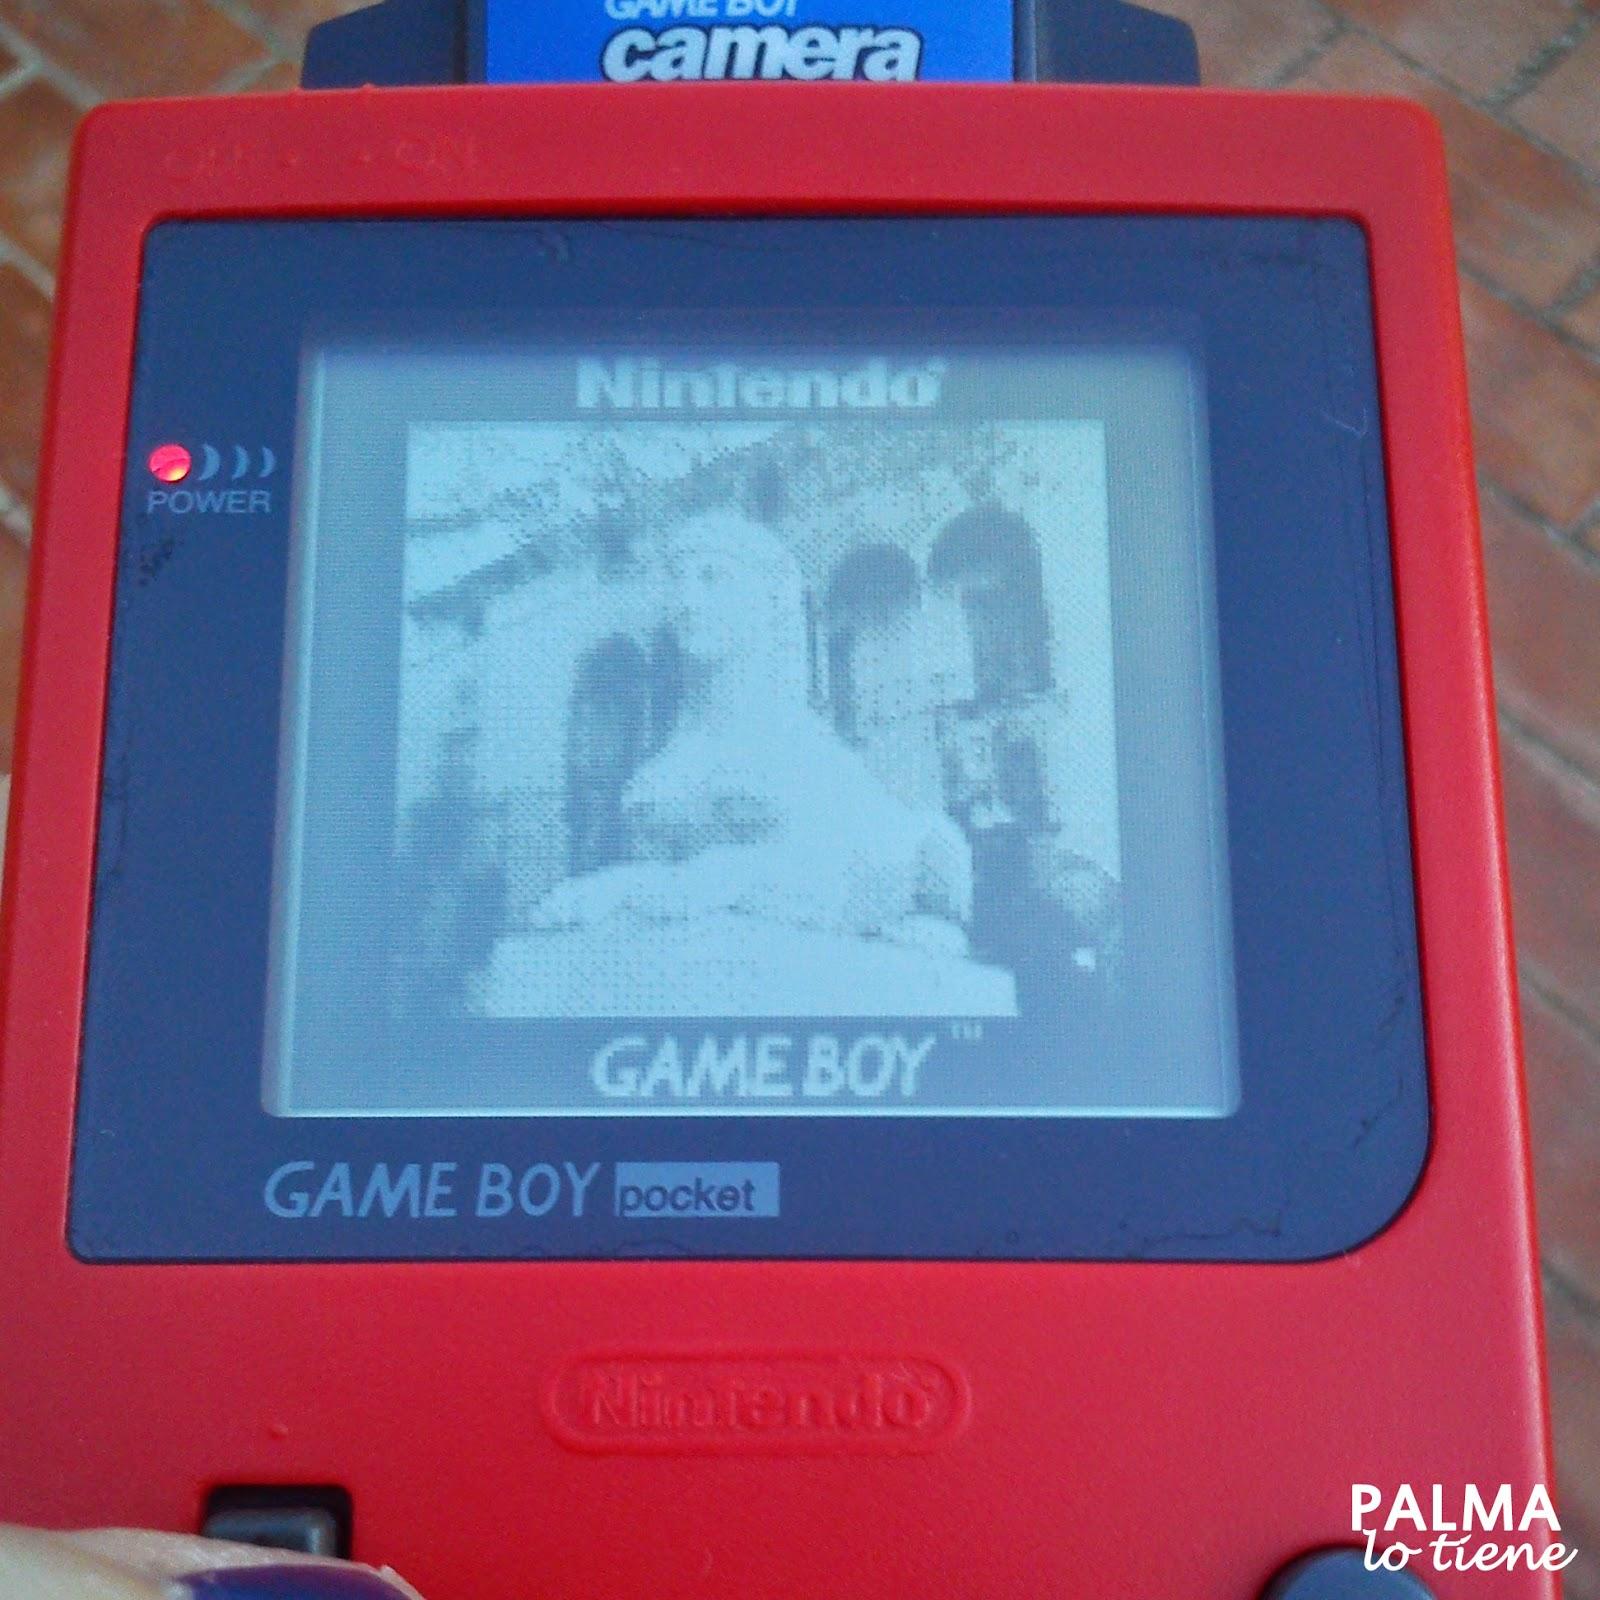 http://palmalotiene.blogspot.com.es/2014/09/palma-atrapada-en-la-game-boy-camera.html